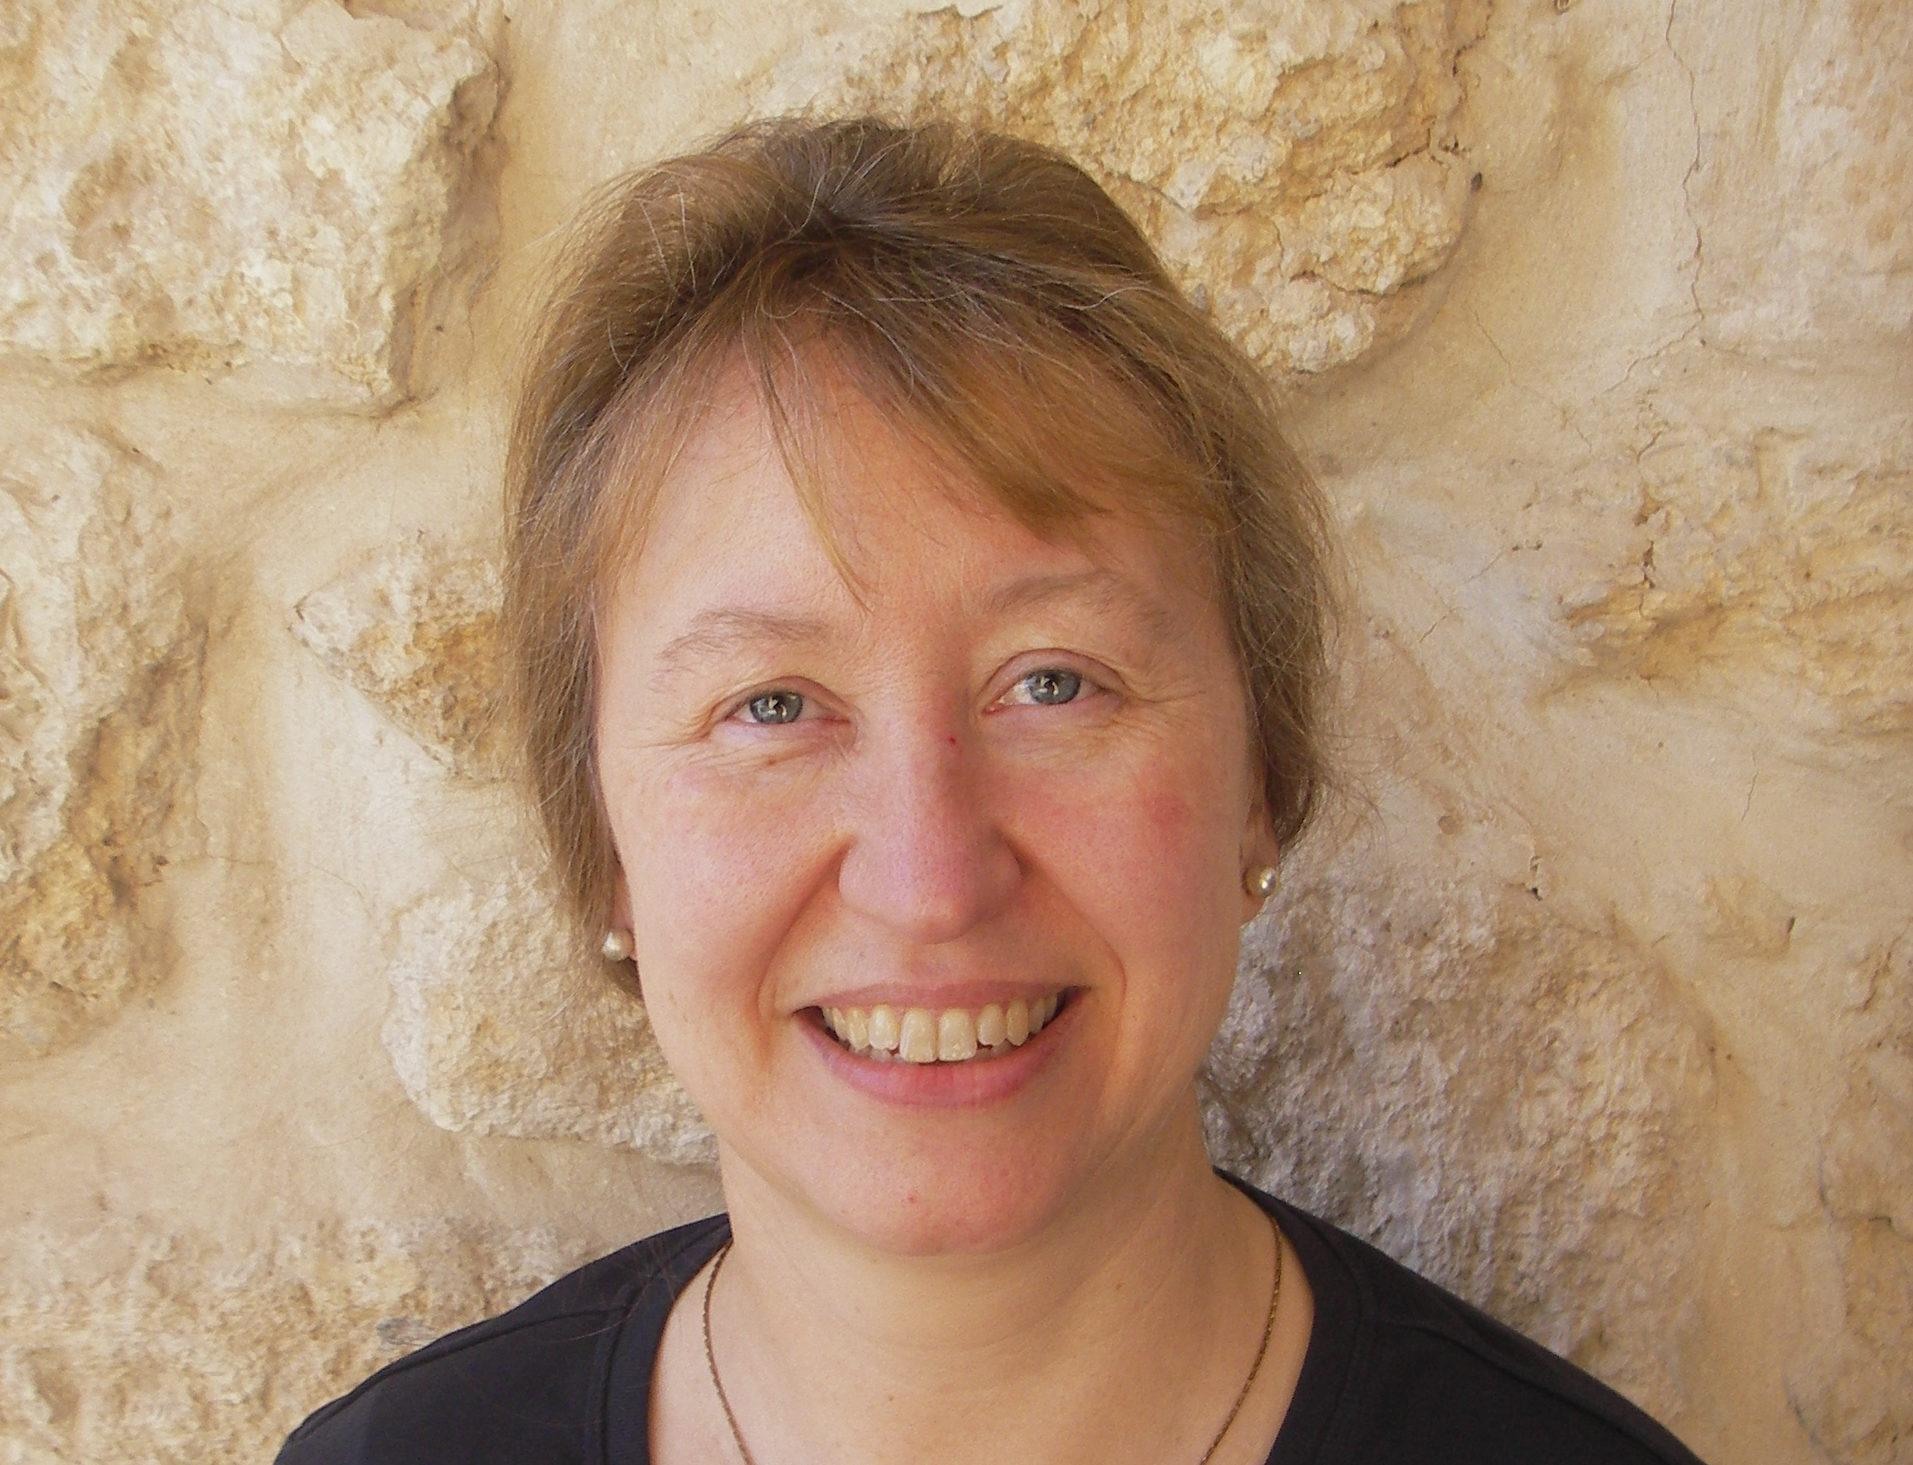 Portraitfoto von Rabbinerin Dr. Antje Deusel. ©Deusel.